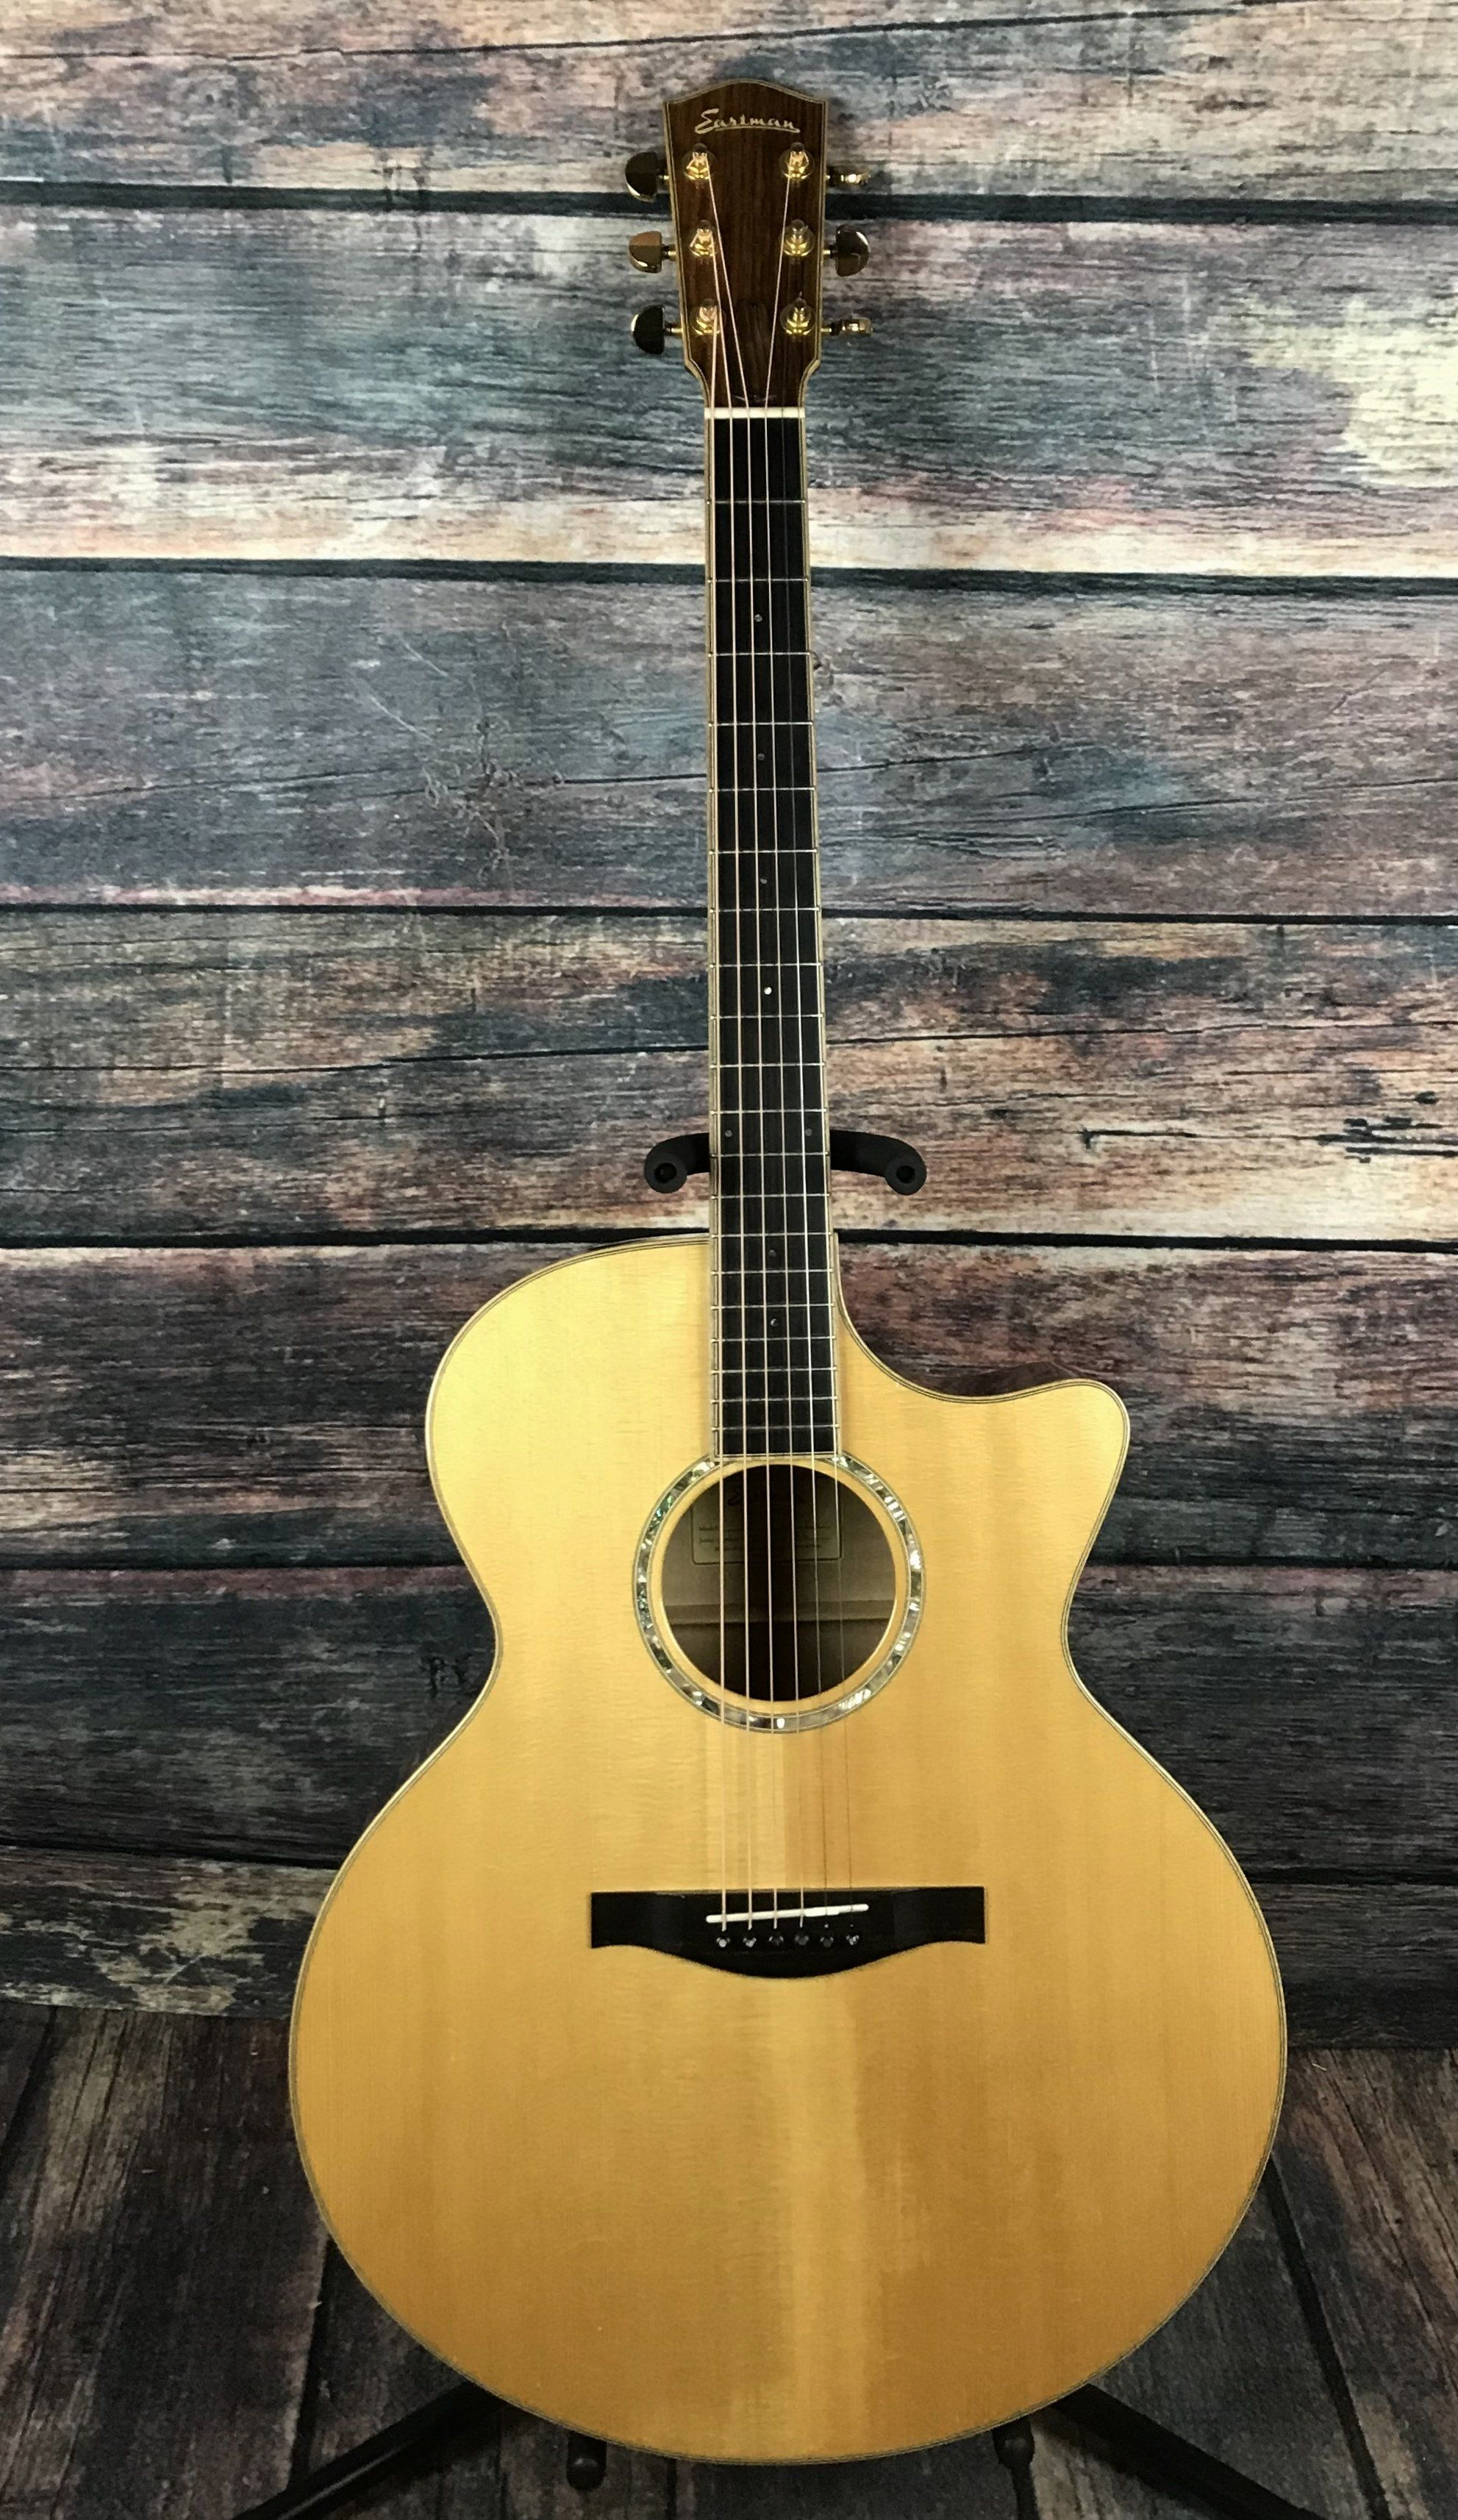 Used Eastman Ac630ce Acoustic Electric Jumbo Guitar With Case Eastman Guitar Acoustic Electric Cool Guitar